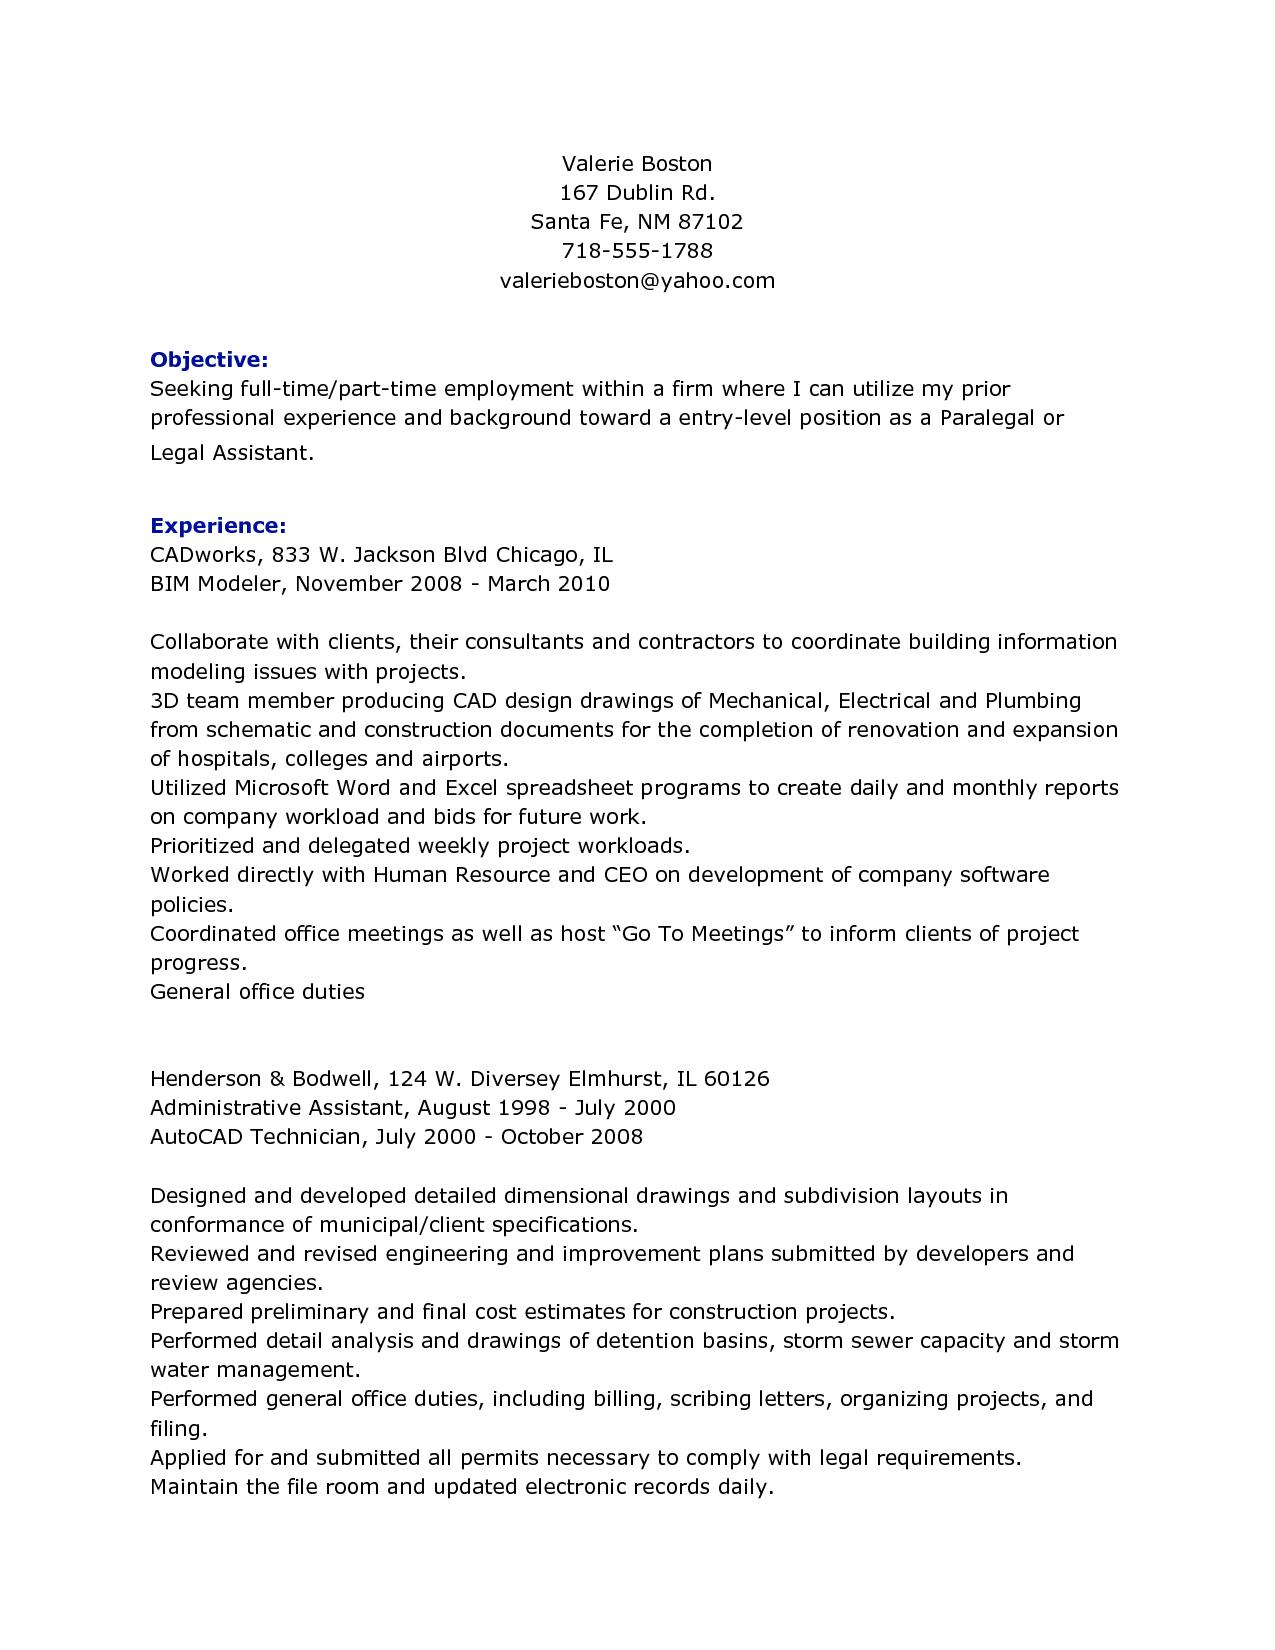 Personal Injury Paralegal Resume Job Resume Samples Job Resume Examples Resume Examples